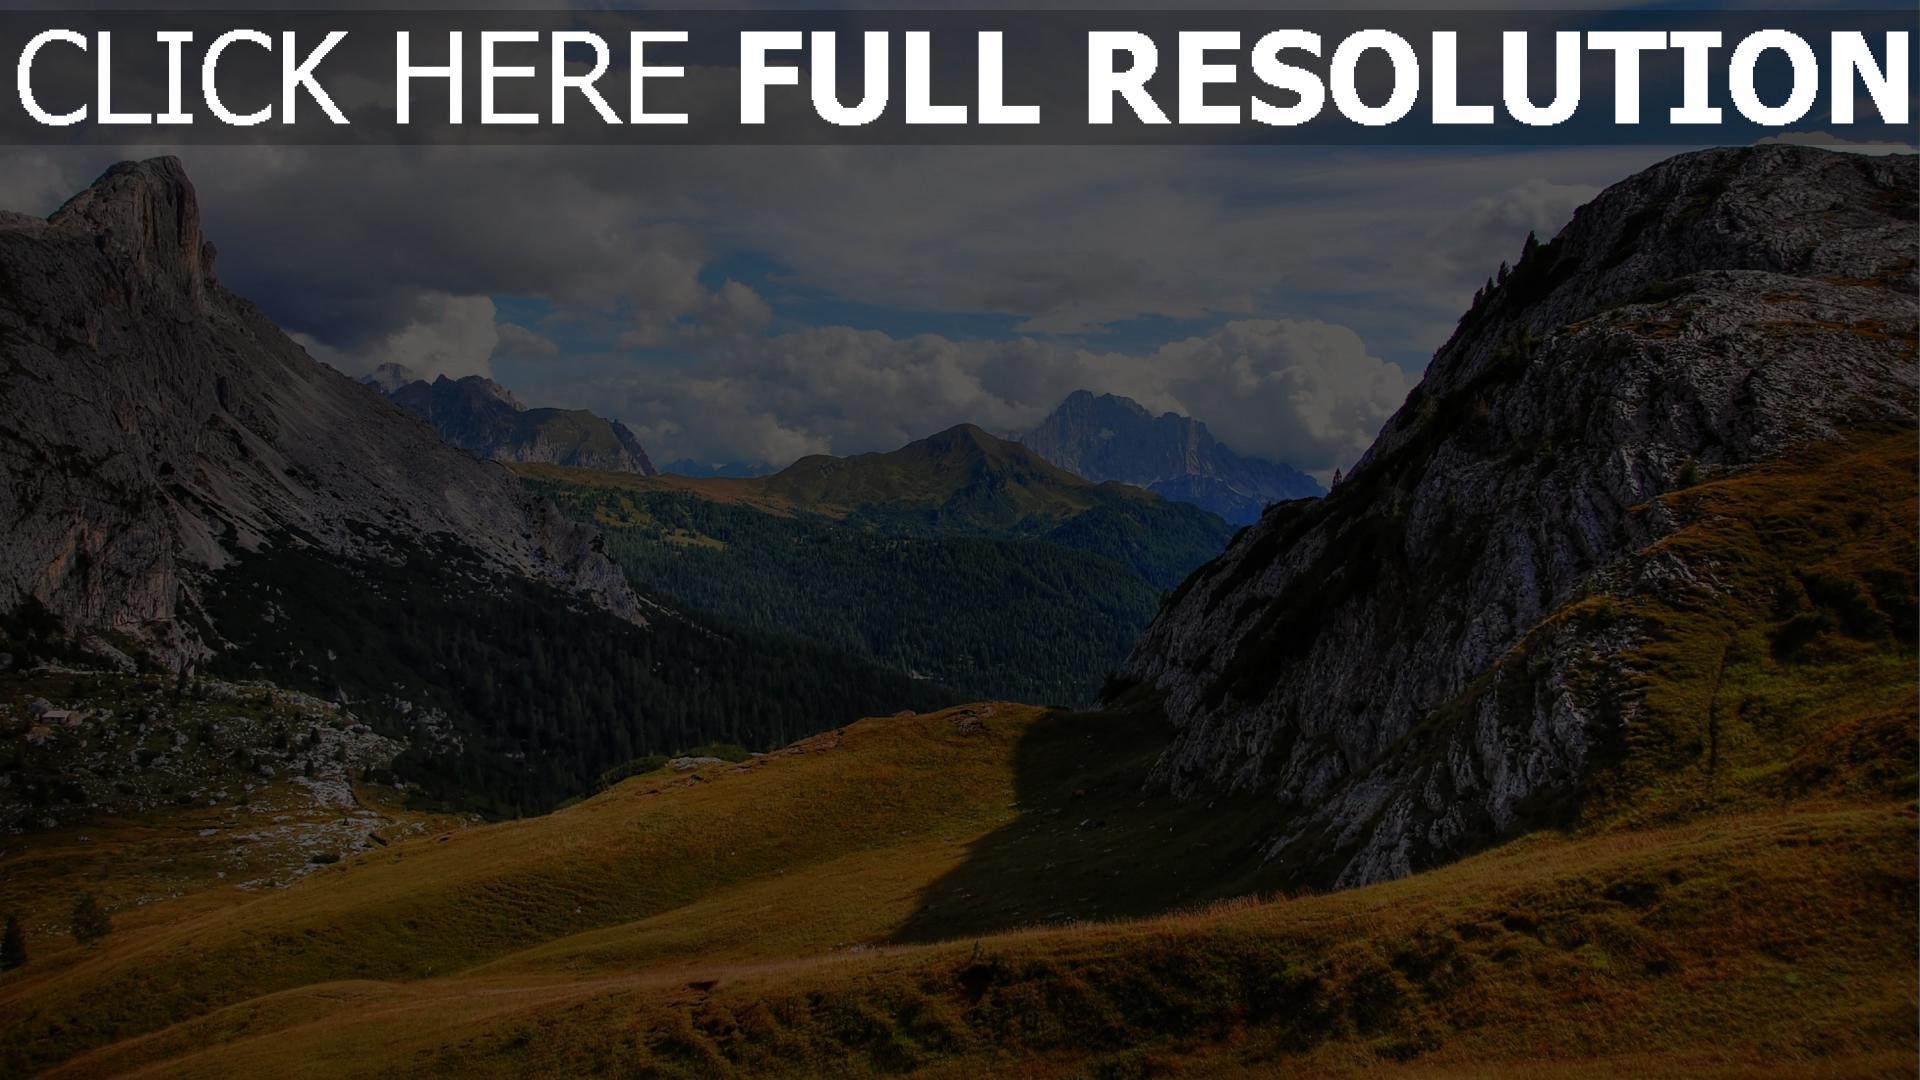 Herunterladen 1920x1080 Full Hd Hintergrundbilder Italien